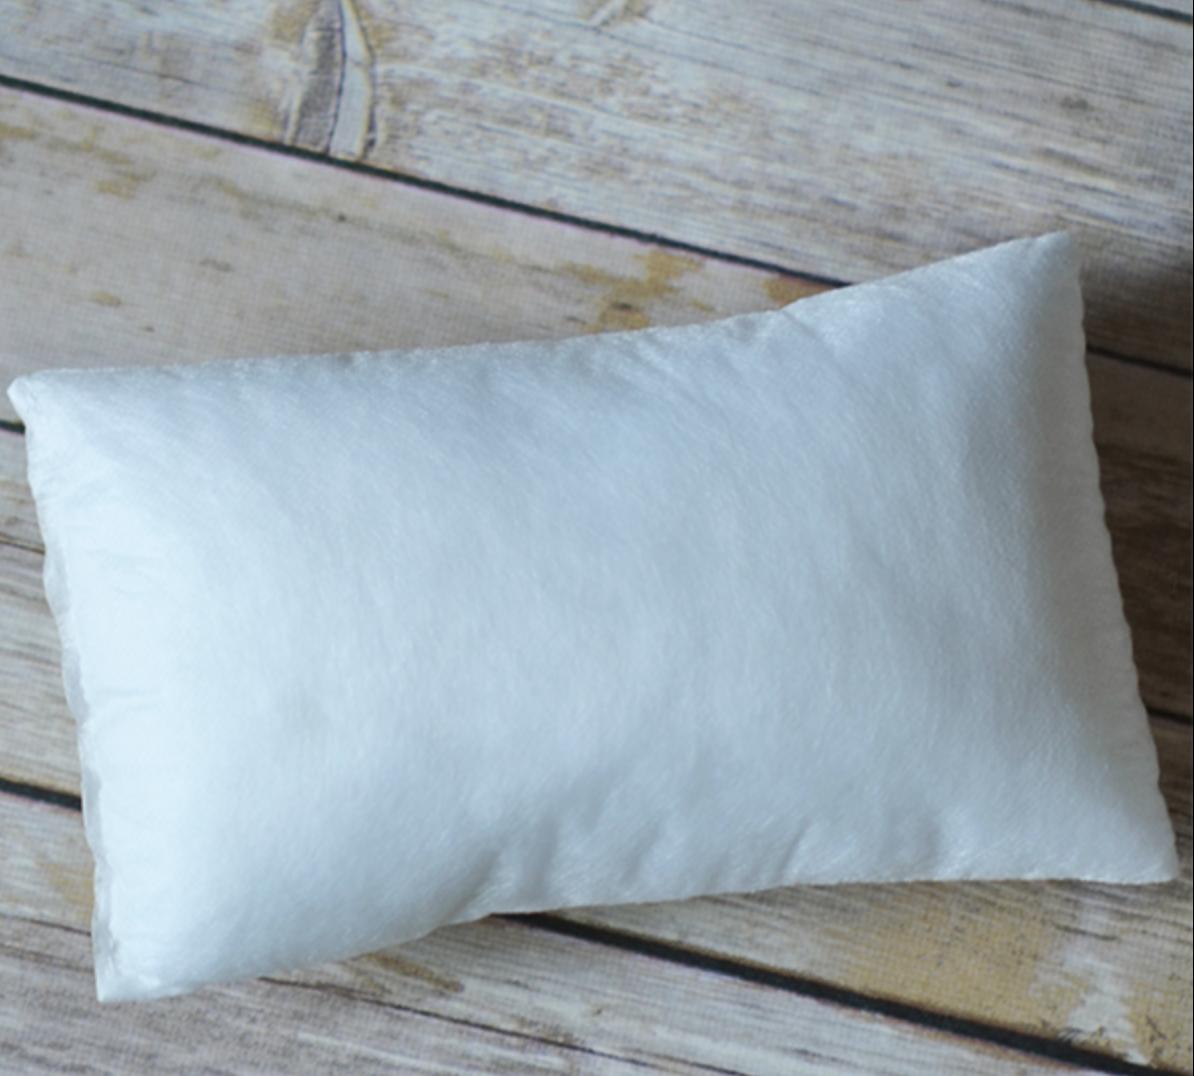 Kimberbell KDKB206 5.5 x 9.5 Pillow blank insert